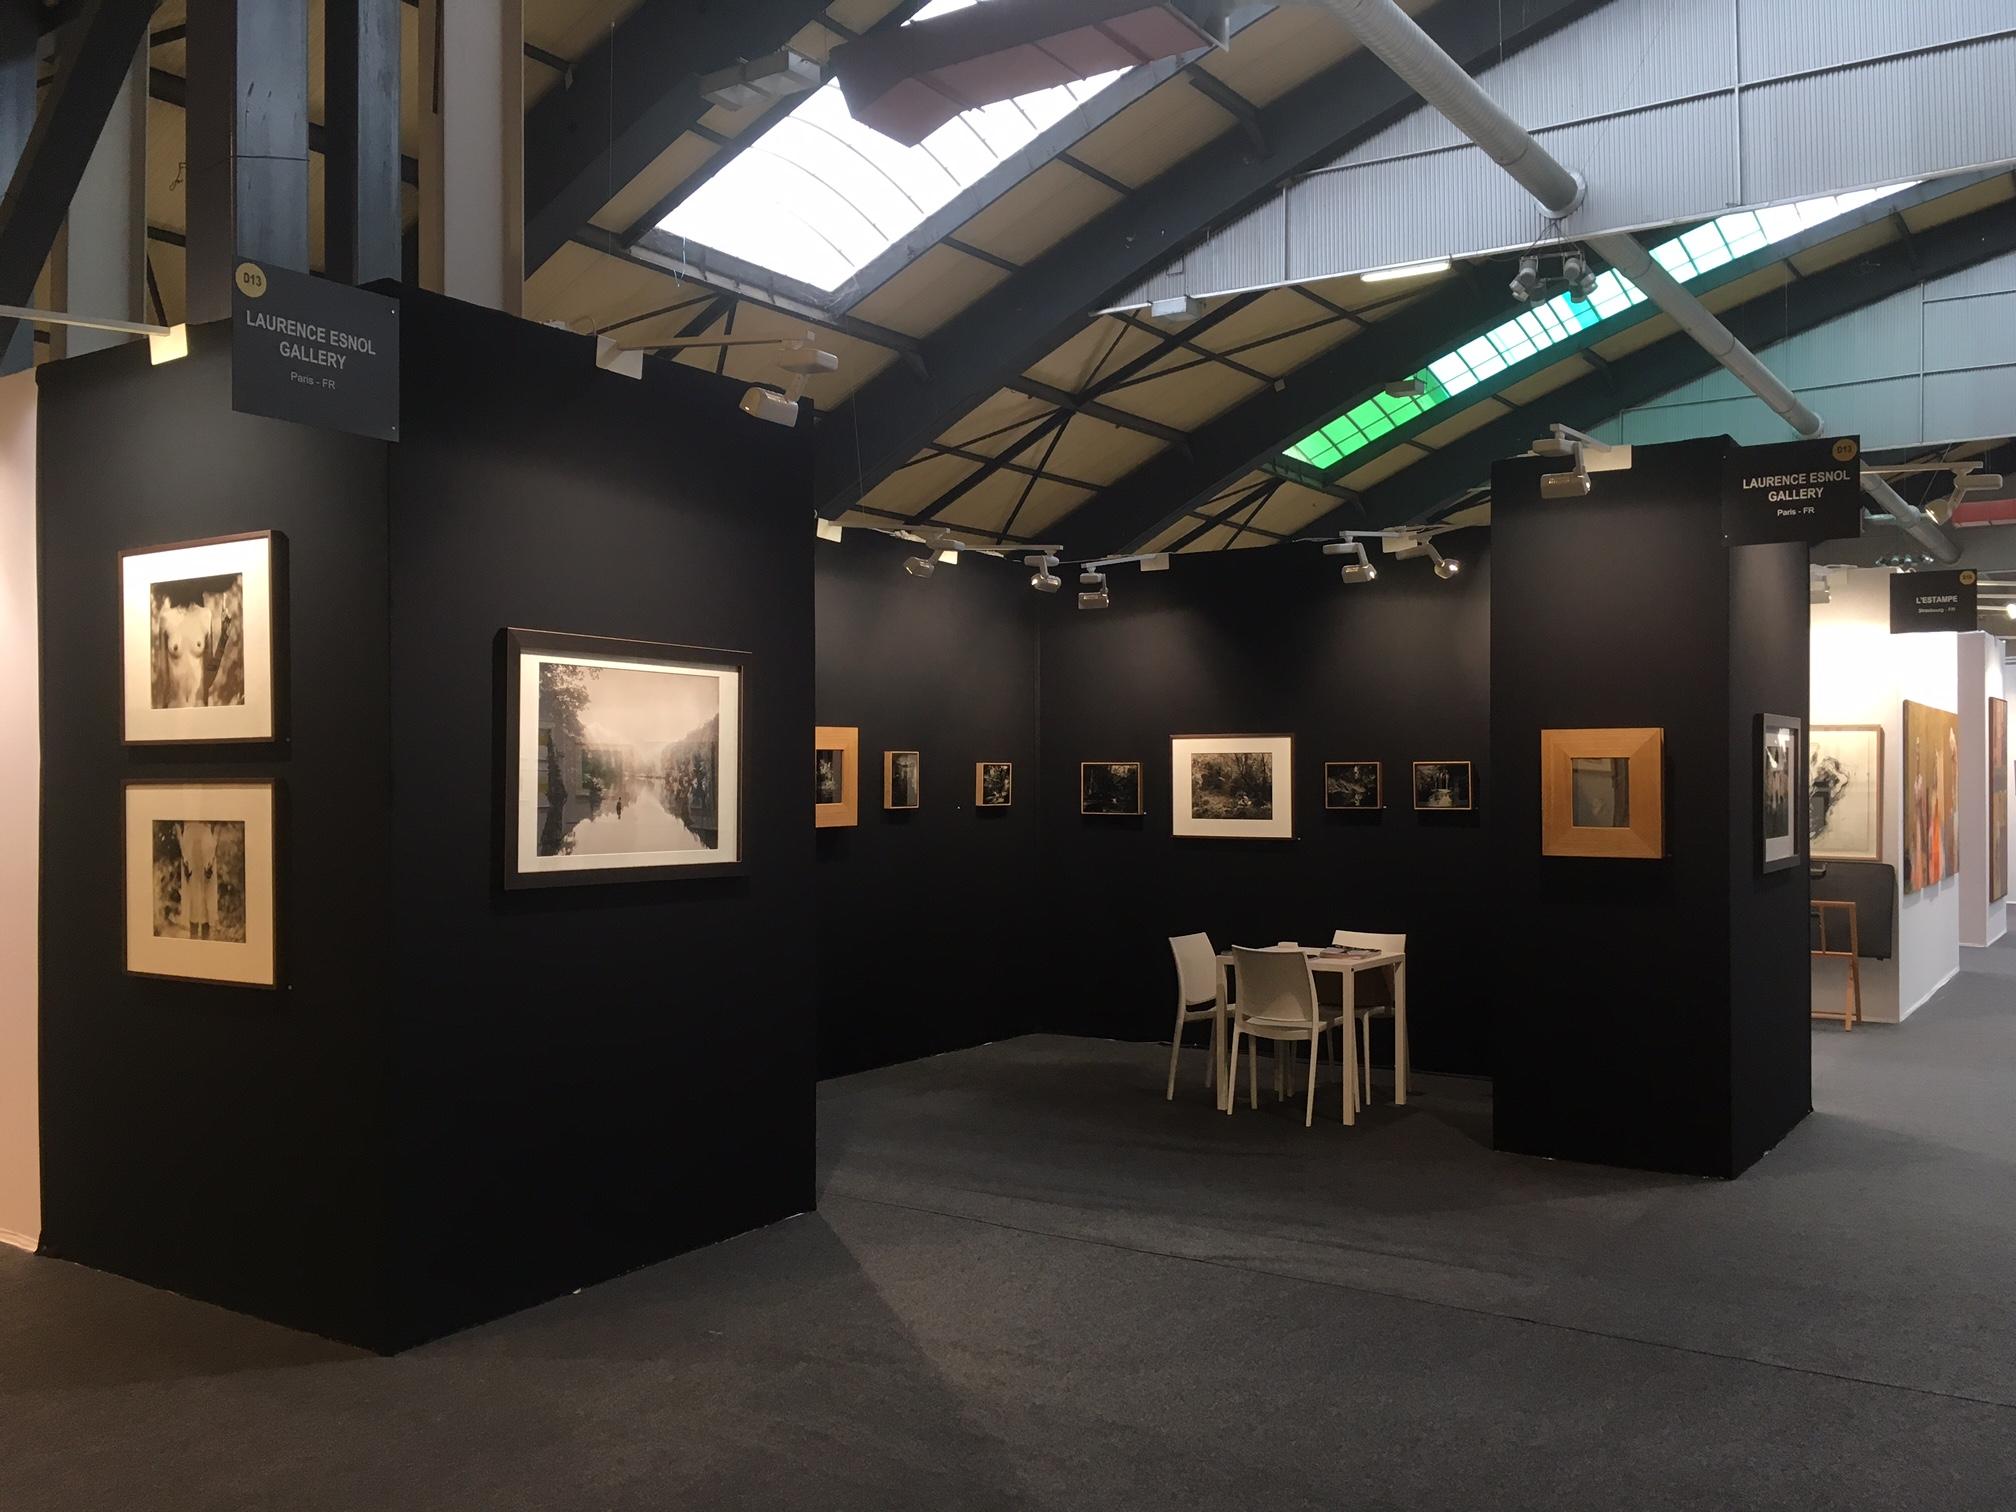 Éric Antoine Stand D13 - St'Art 2016 - Laurence Esnol Gallery avec le photographe Eric Antoine 2019